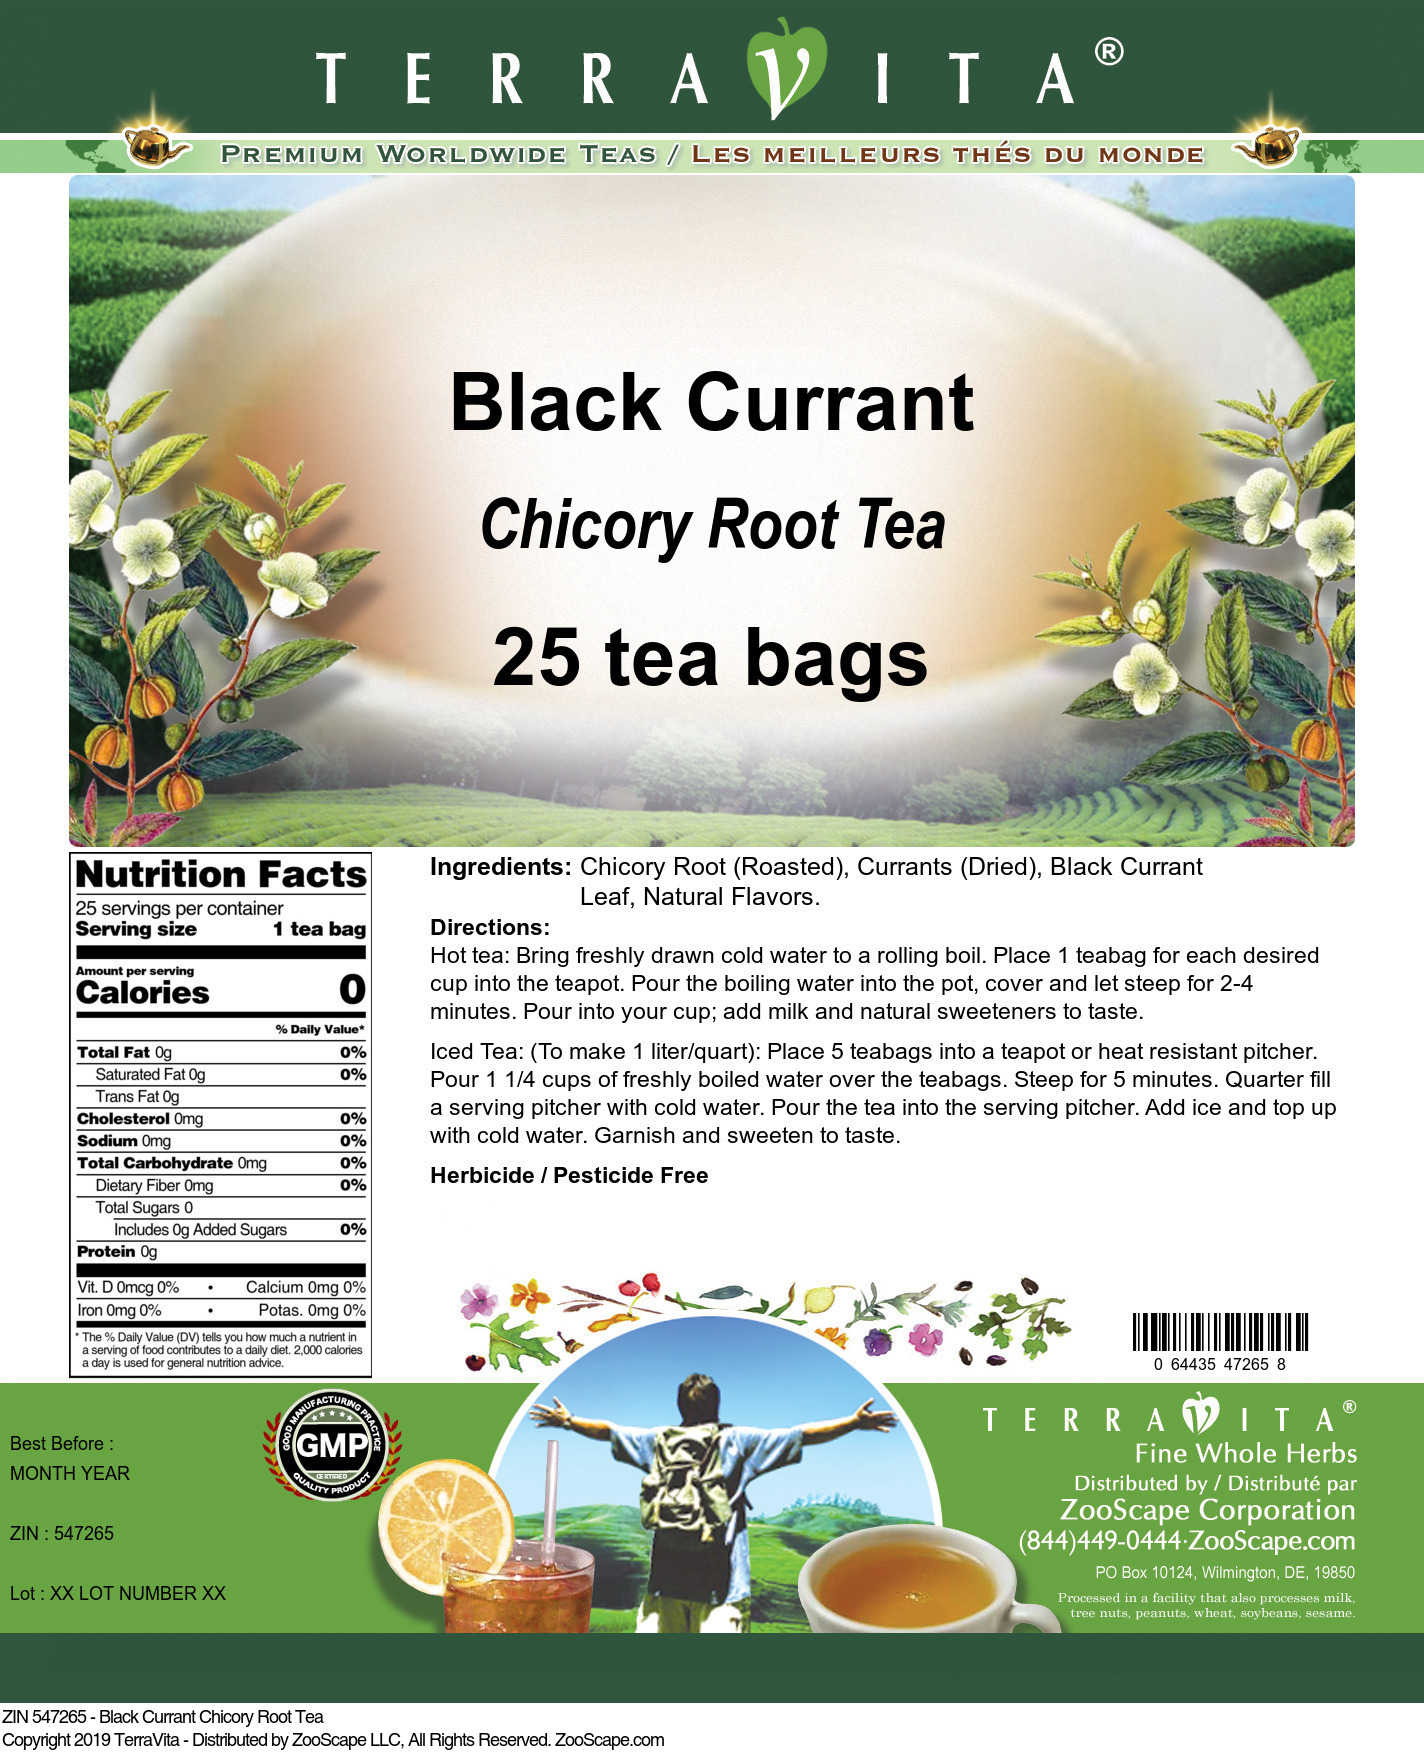 Black Currant Chicory Root Tea